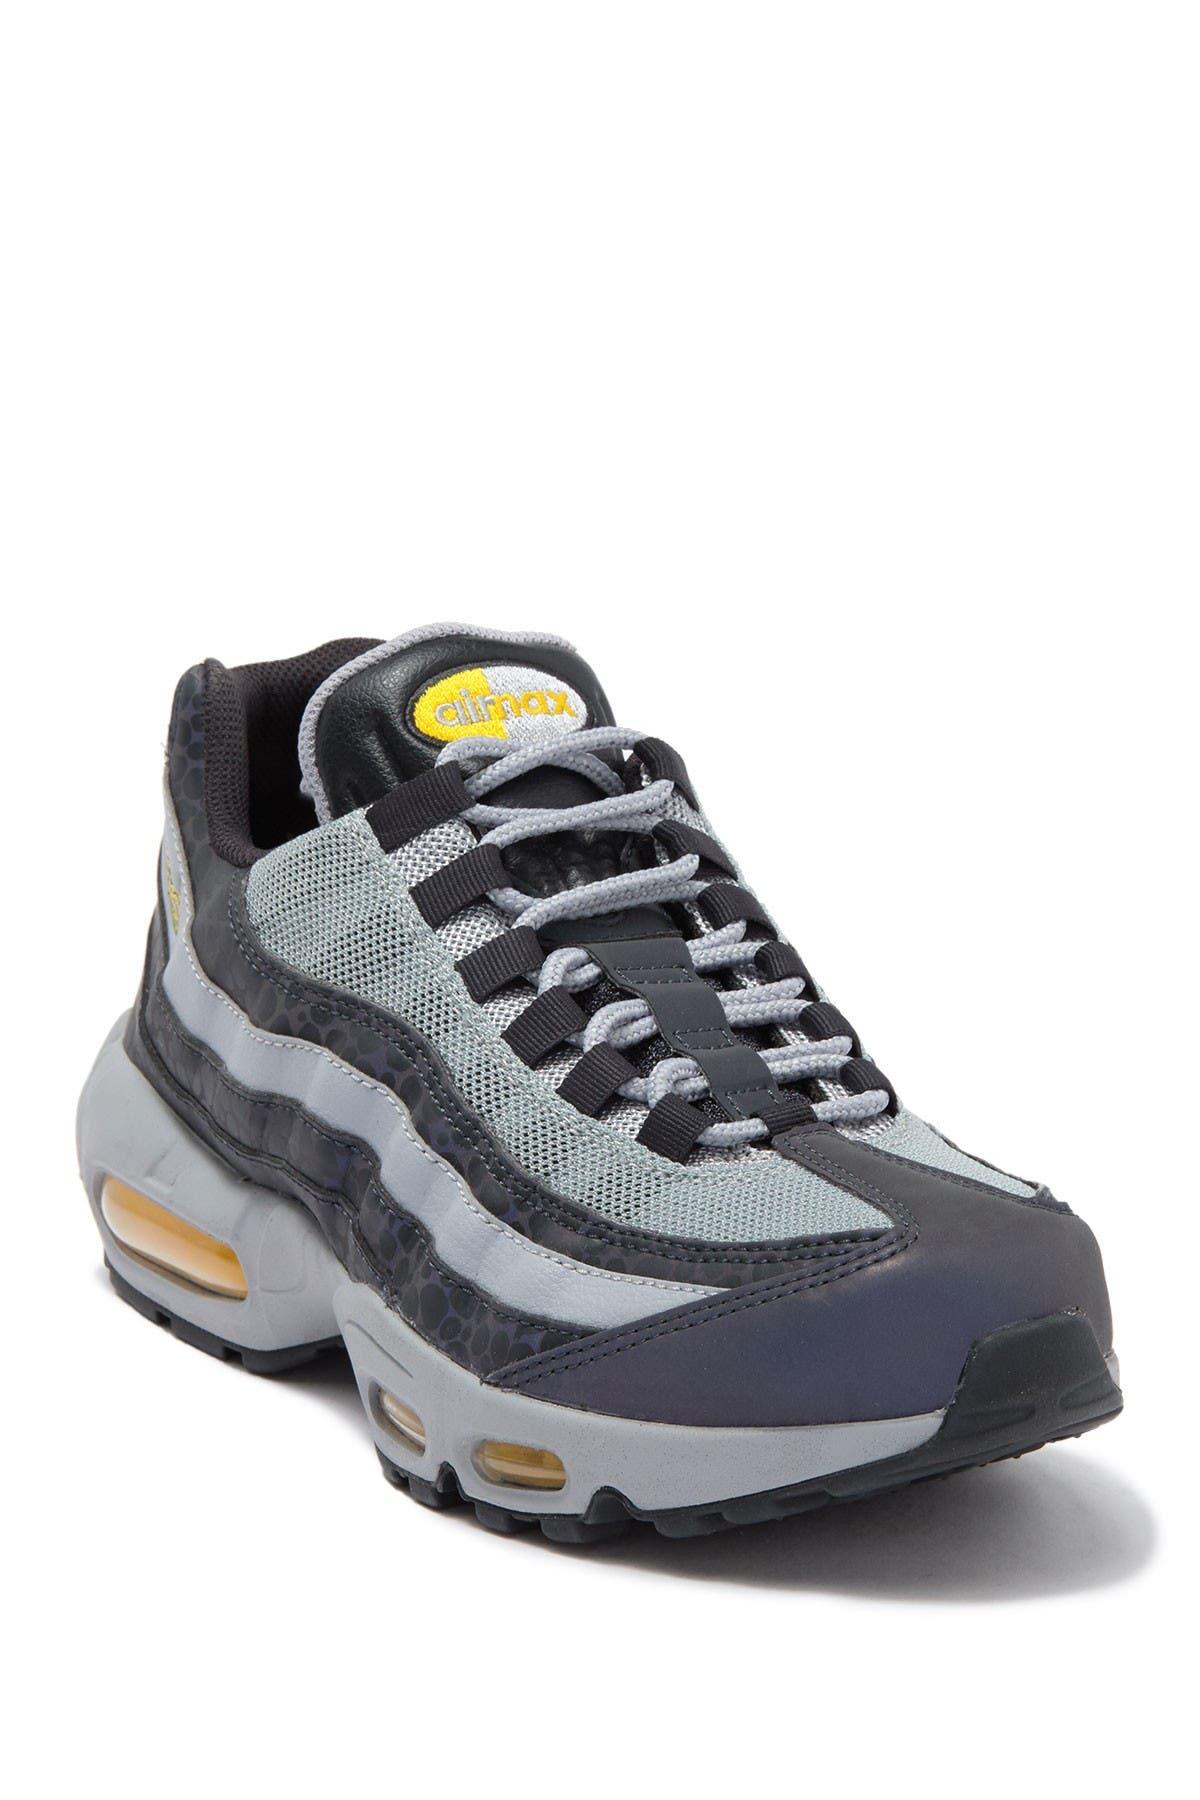 Nike | Air Max 95 SE Reflective Sneaker